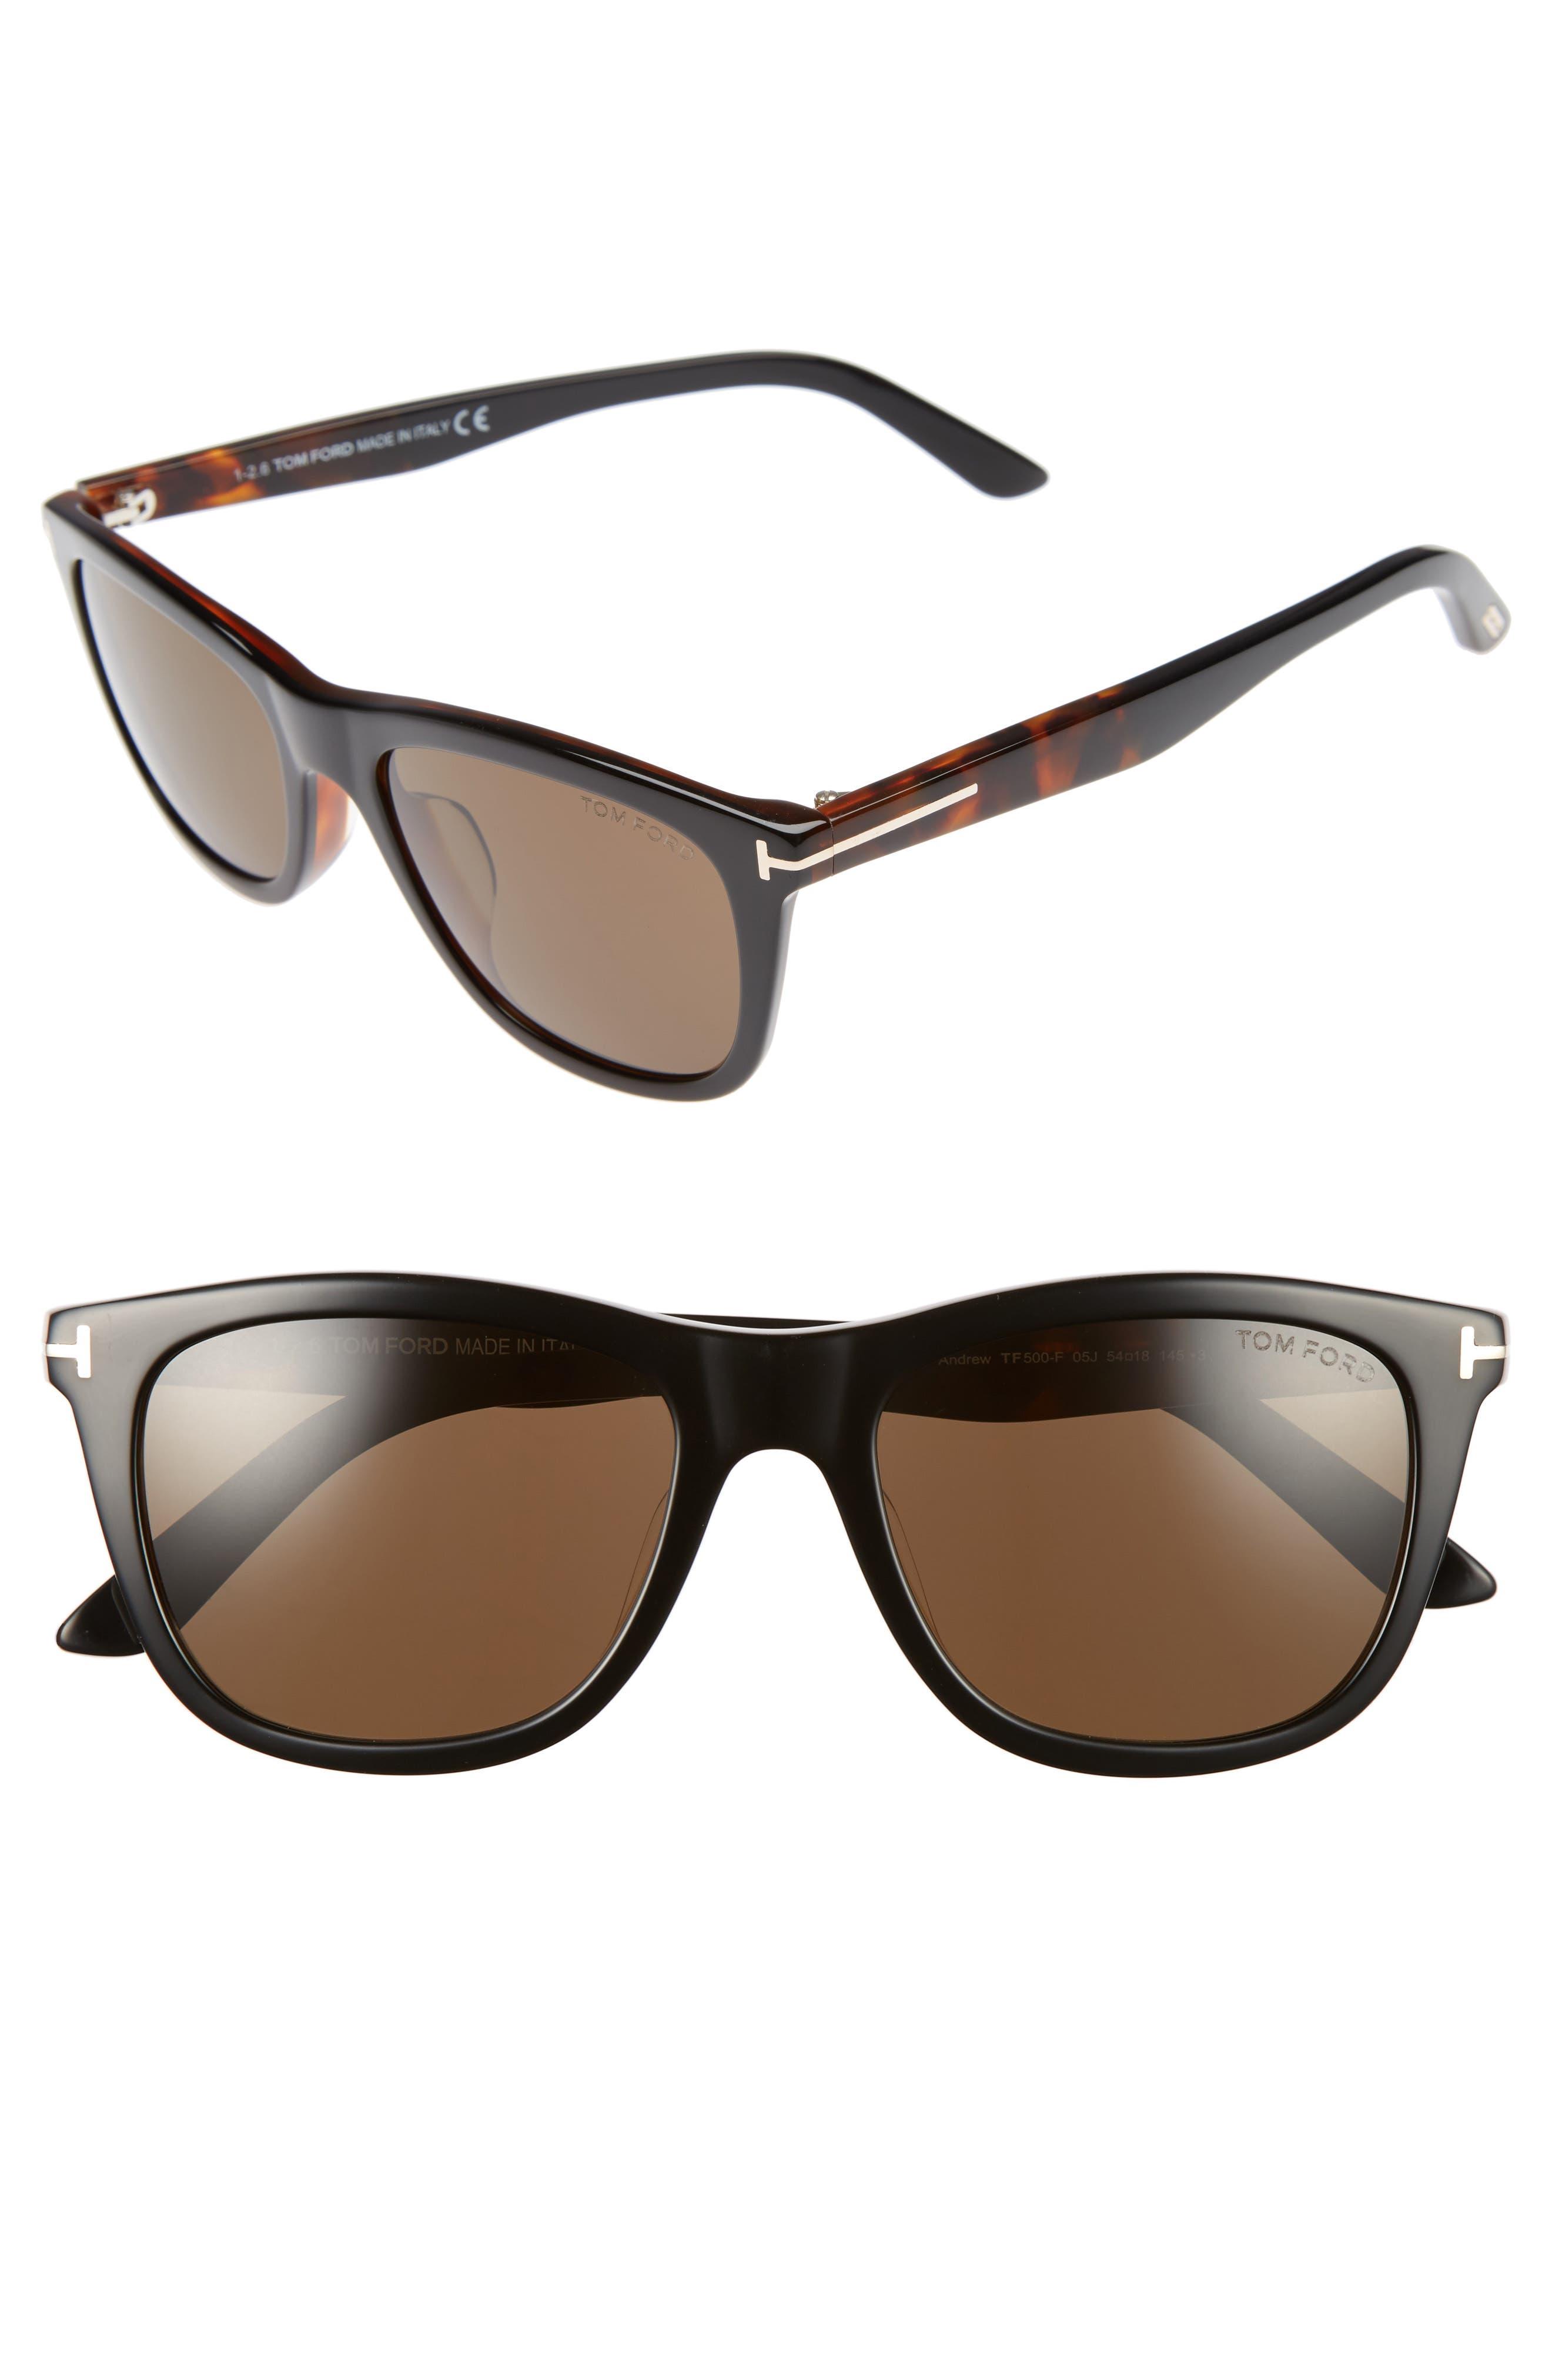 Andrew 54mm Rectangular Sunglasses,                         Main,                         color, 001